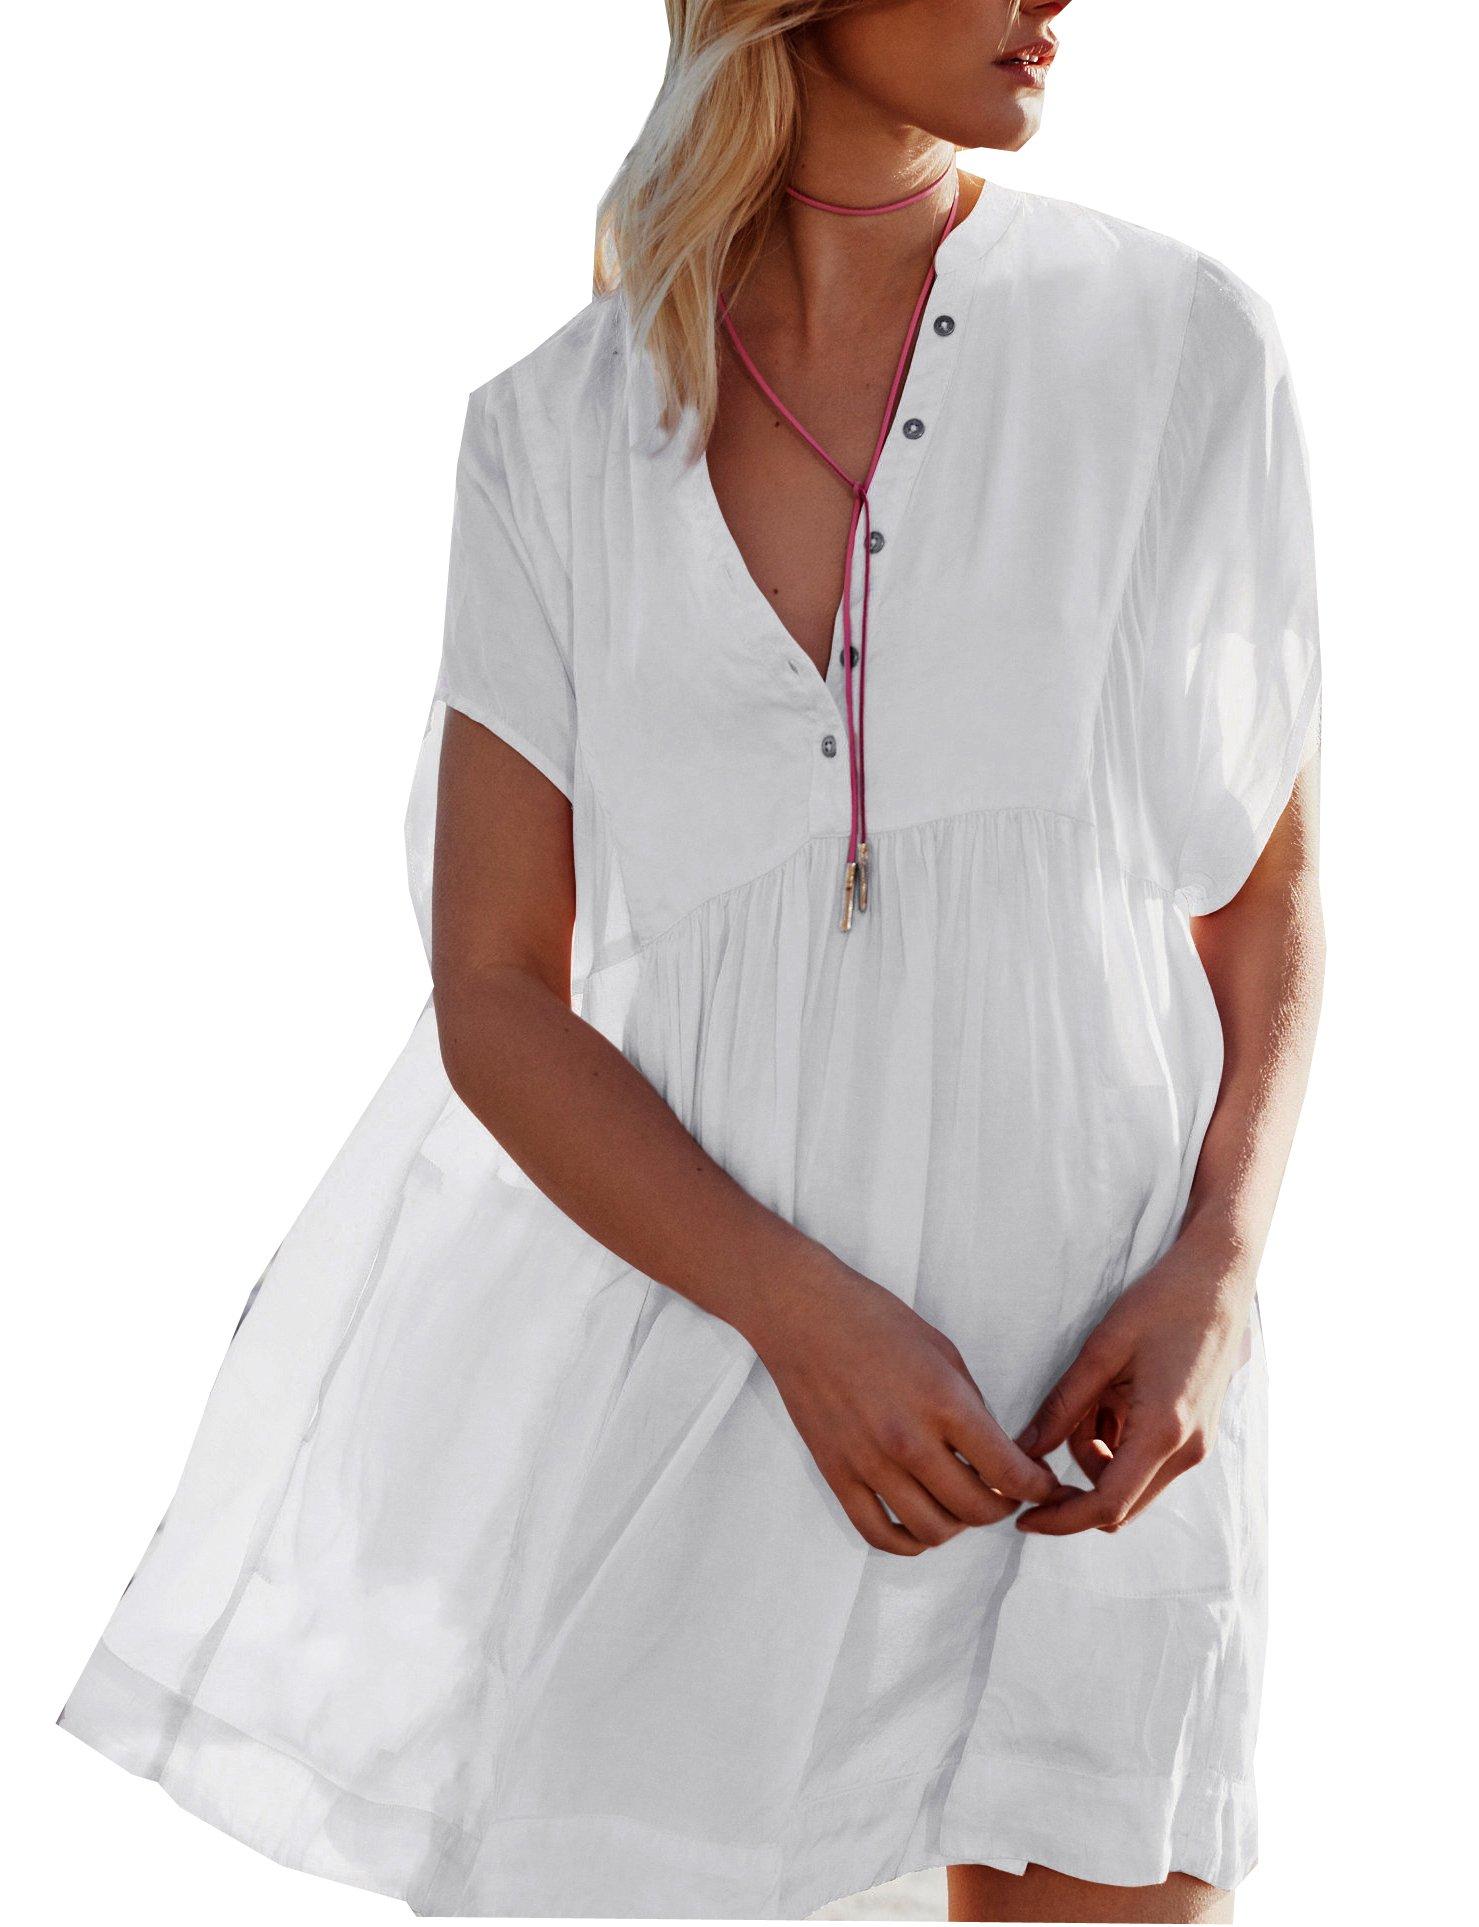 Wander Agio Cover up Beach Swimsuit V-Neck Bikini Covers Swimwear for Women Button White